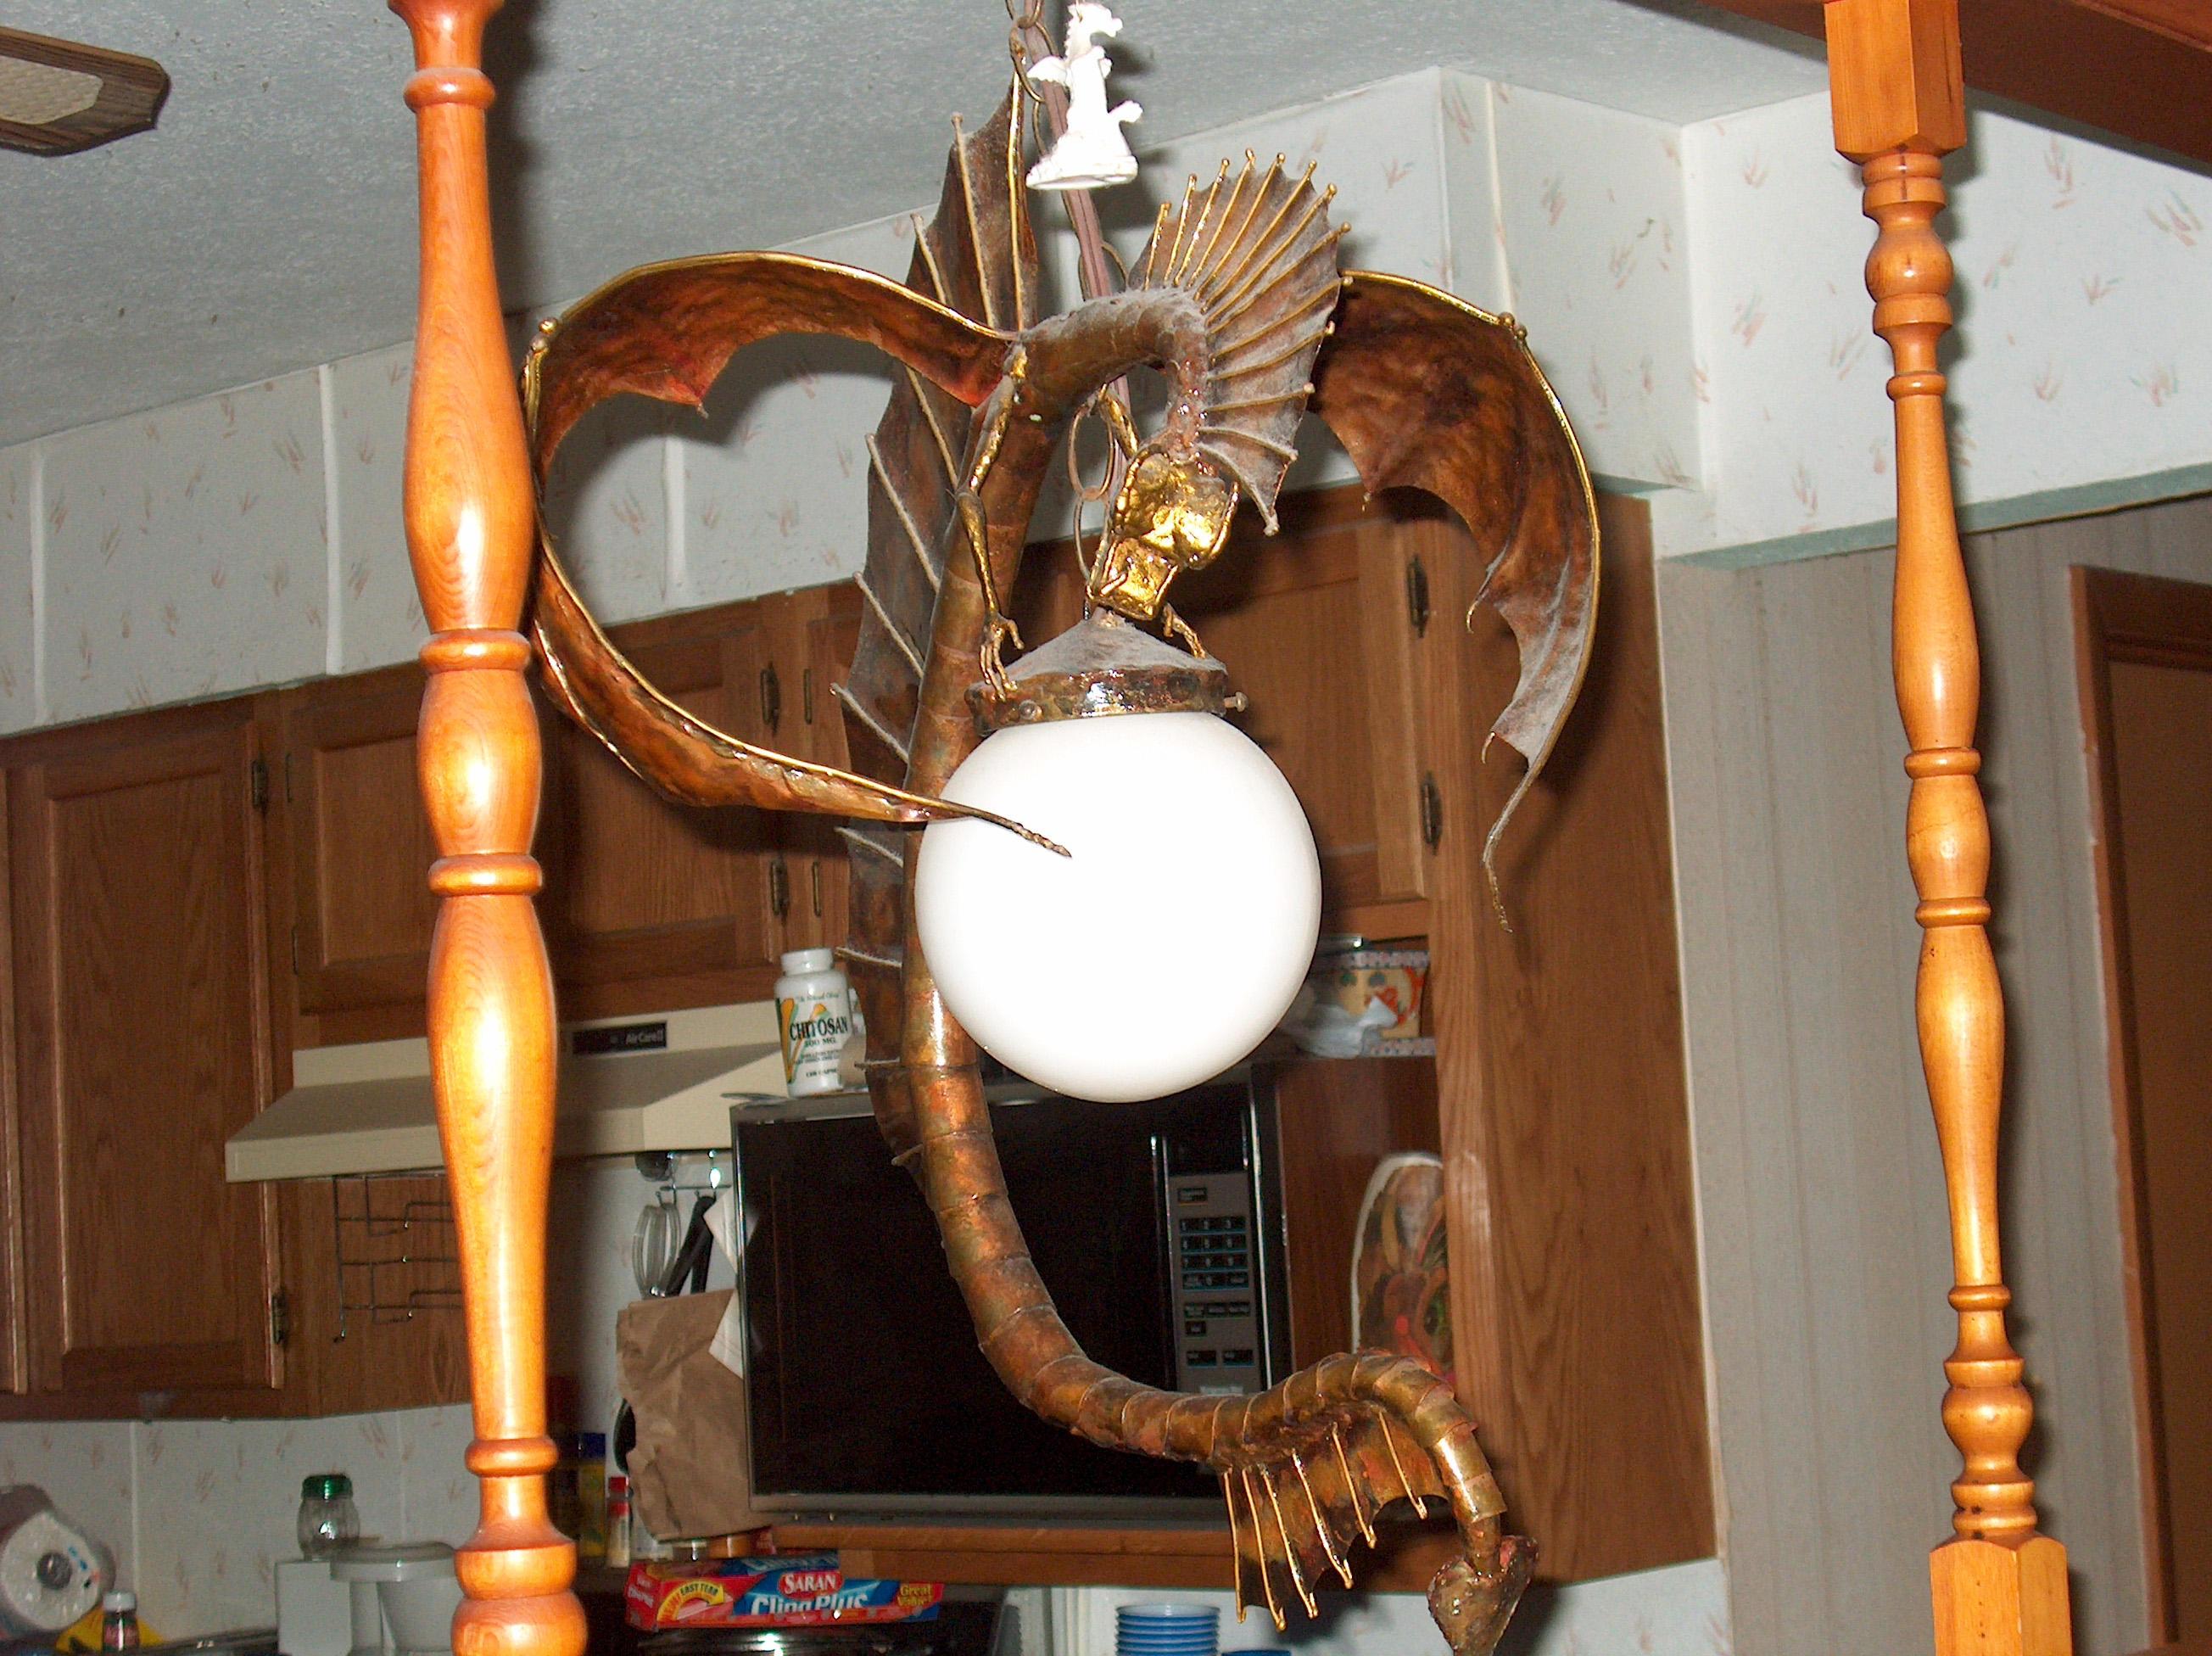 Dragon chandelier three by Merme87 on DeviantArt